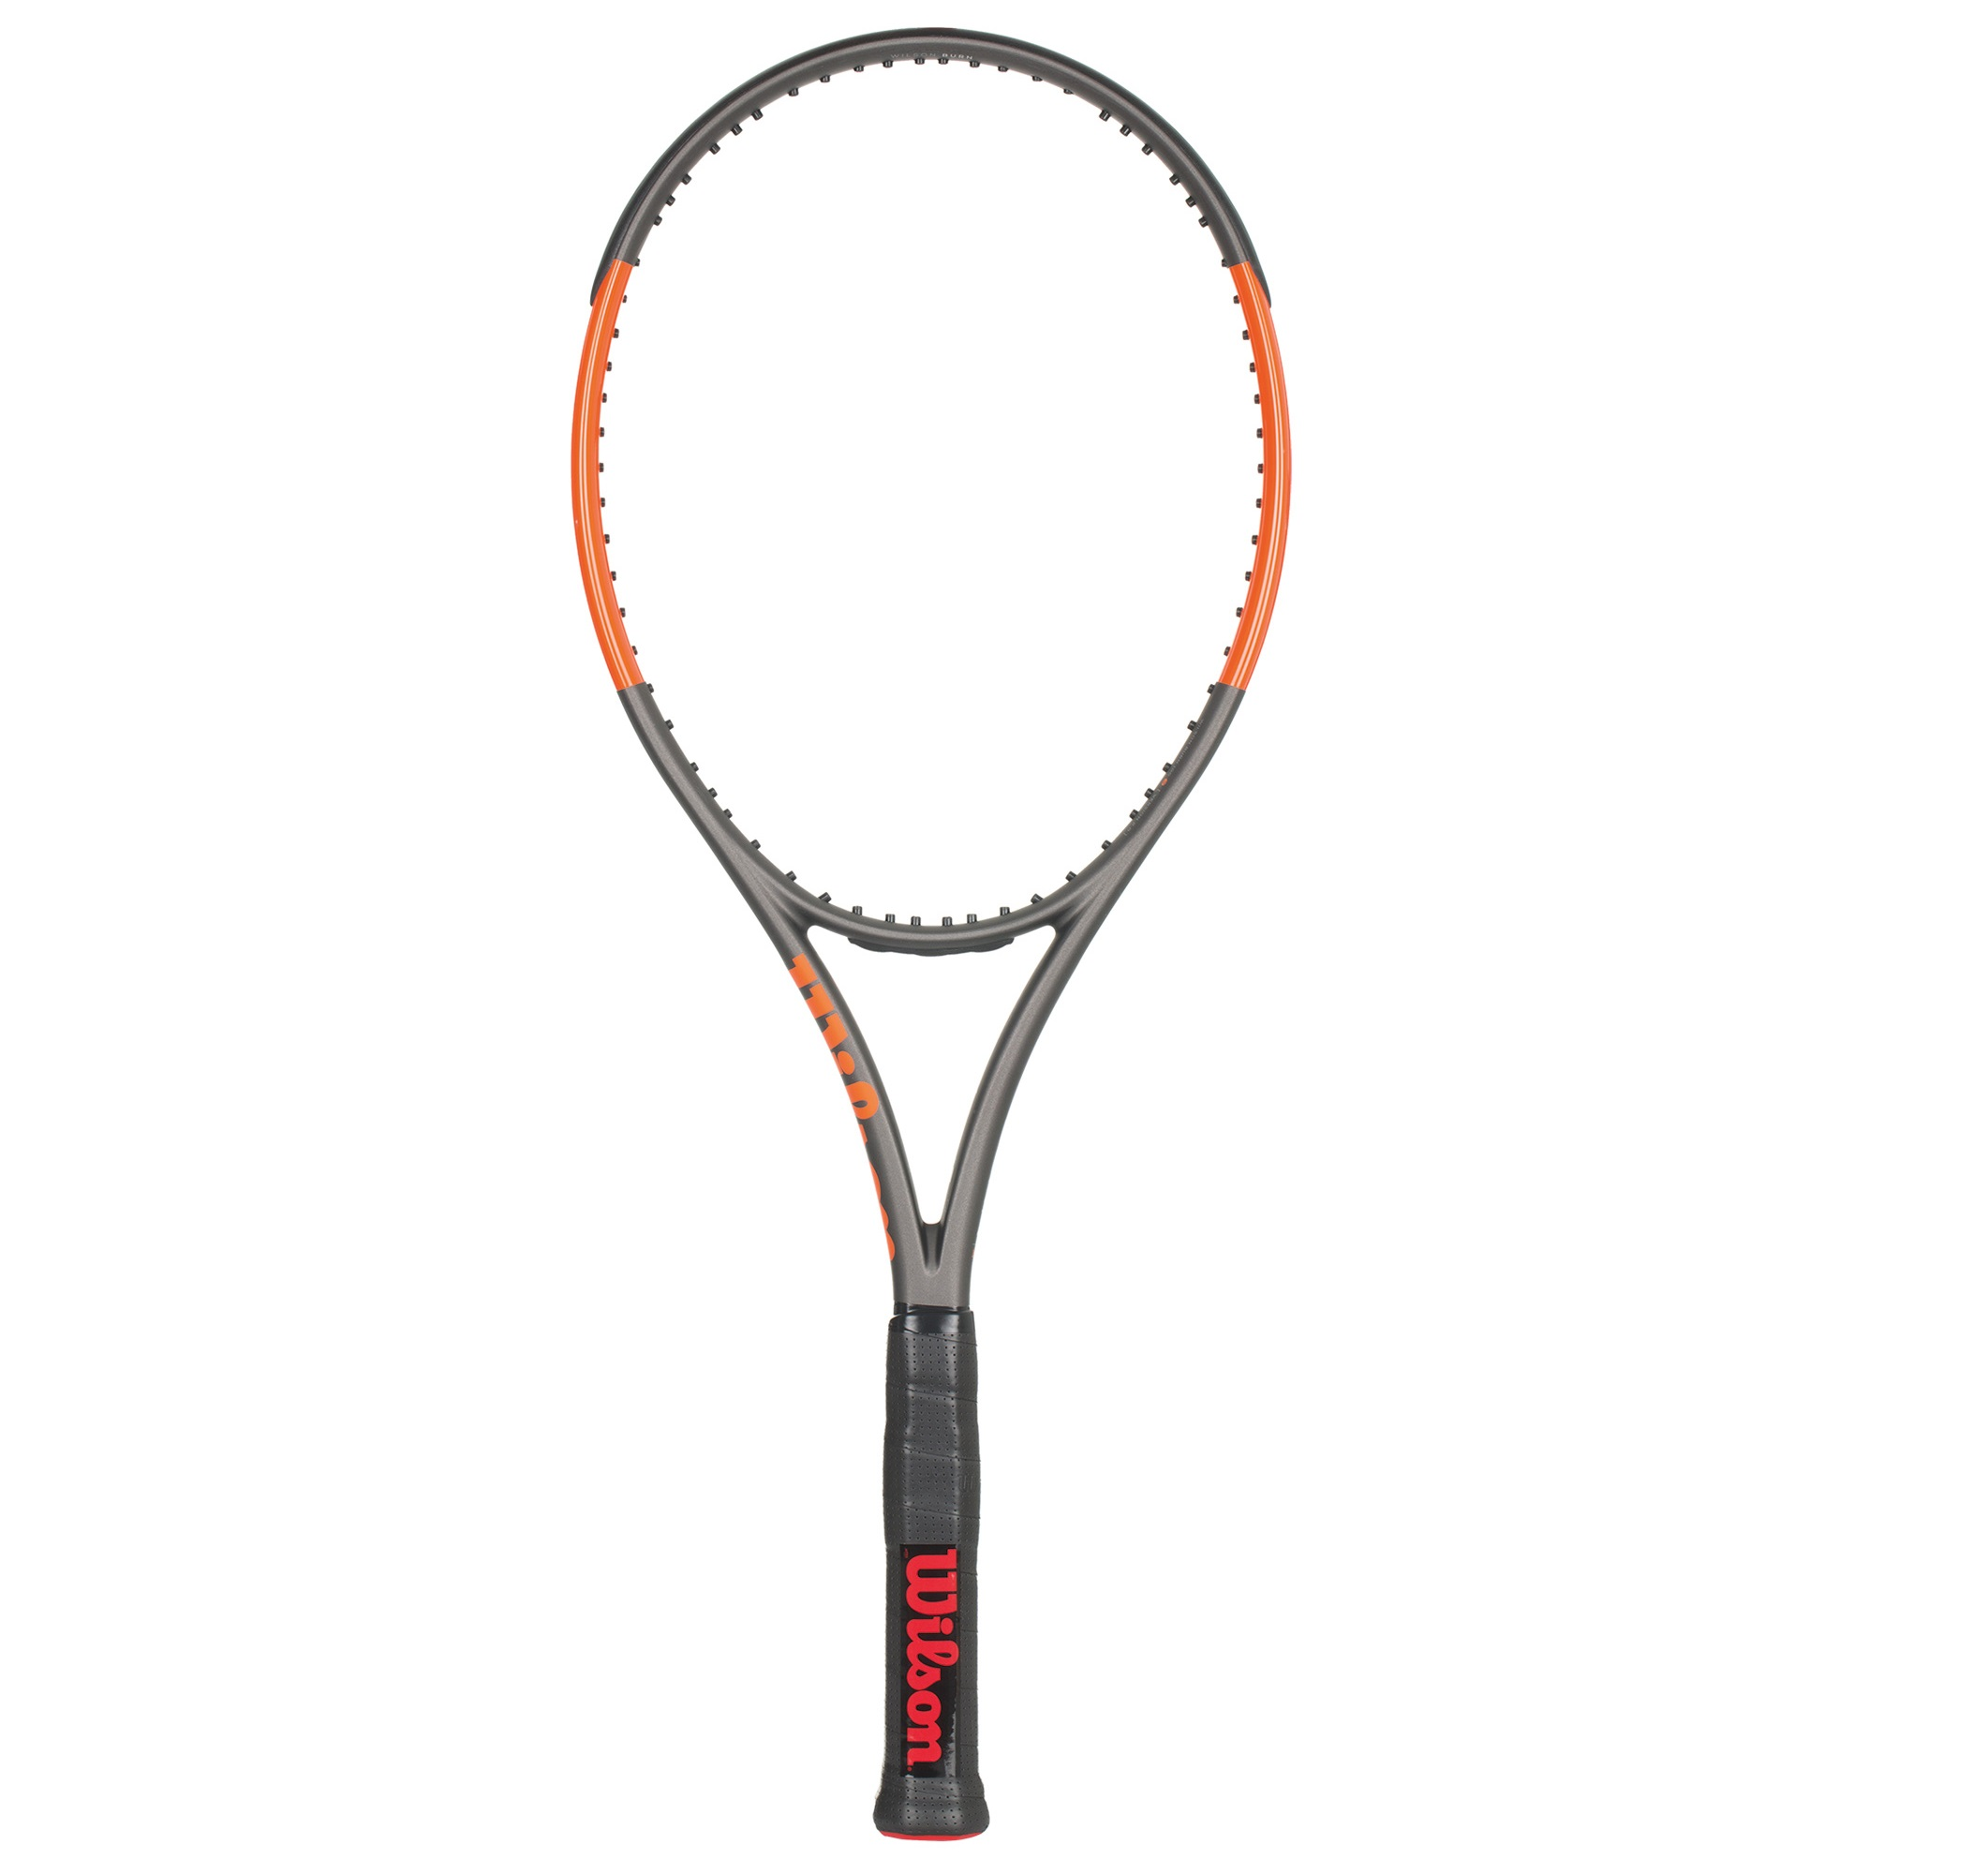 Wilson Ракетка для большого тенниса Wilson Burn 100 CV, размер 4 wilson ракетка для большого тенниса детская wilson roger federer 23 размер без размера